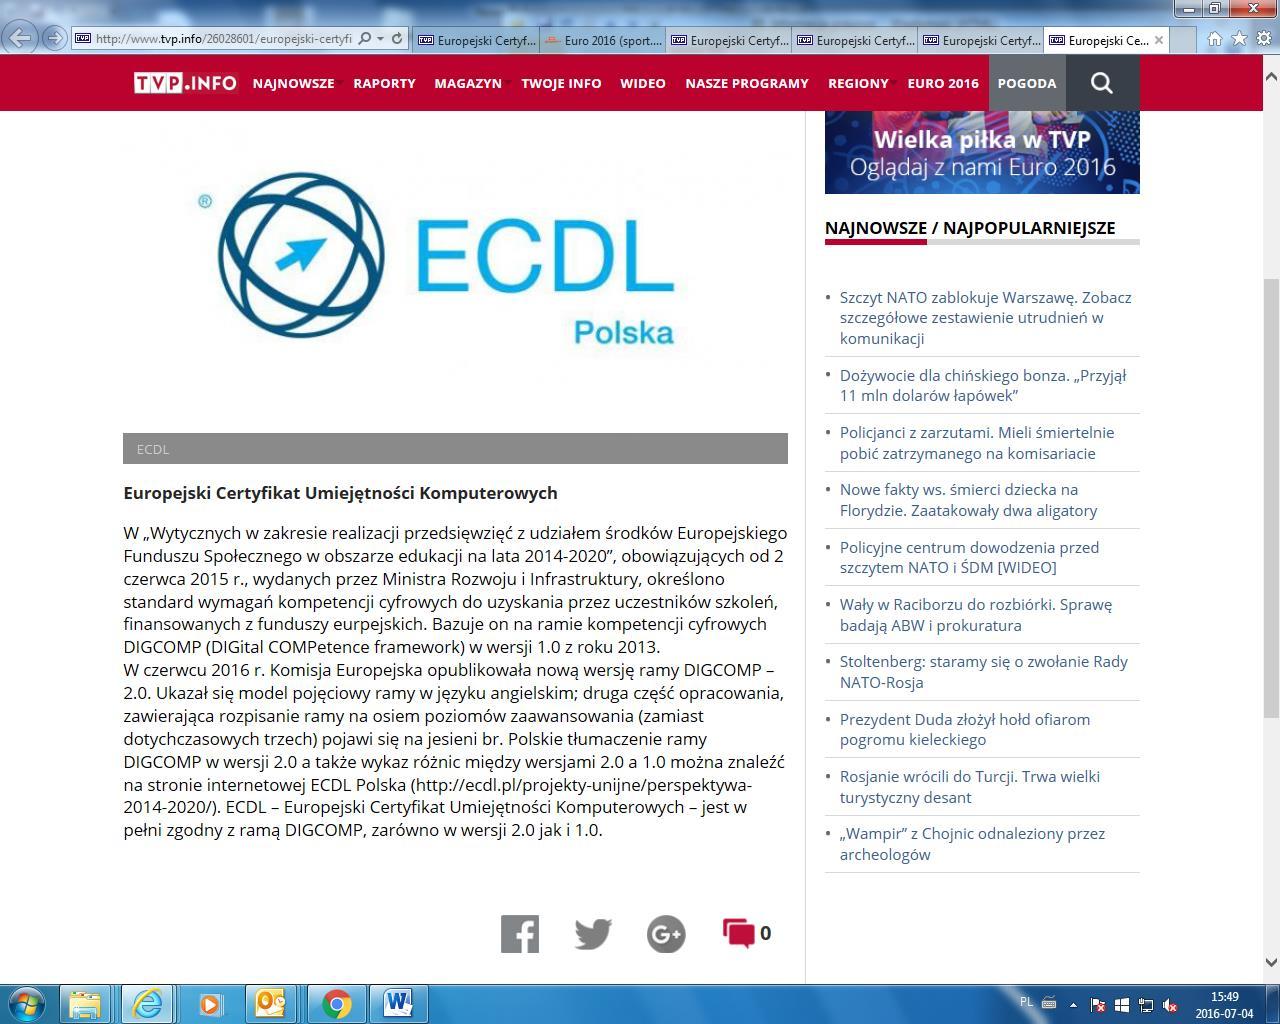 zrzut ekranu z TVP.INFO ECDL Polska